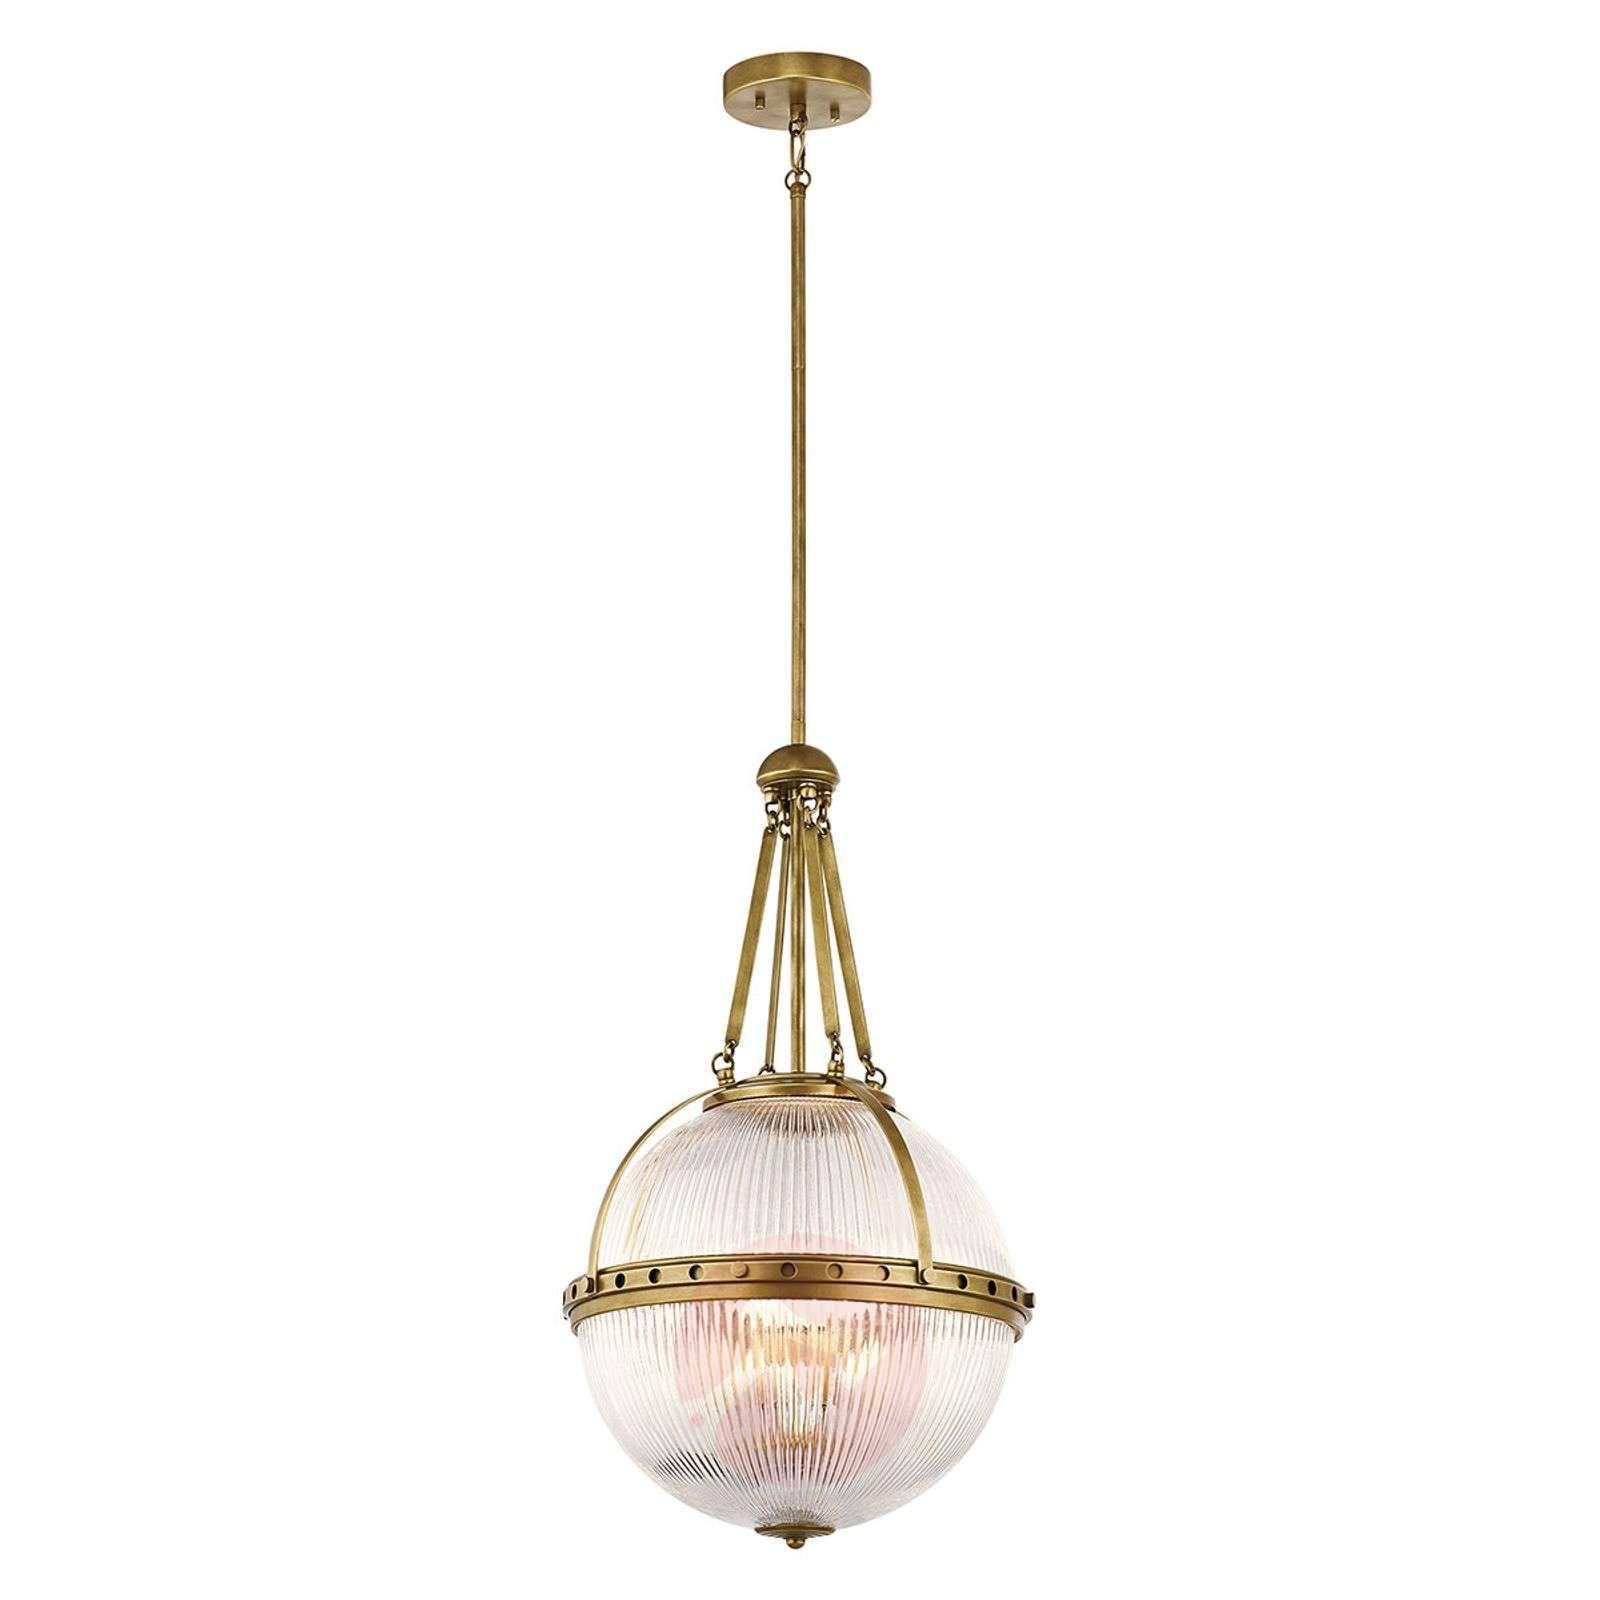 Spherical hanging light Aster, brass-3048912-01